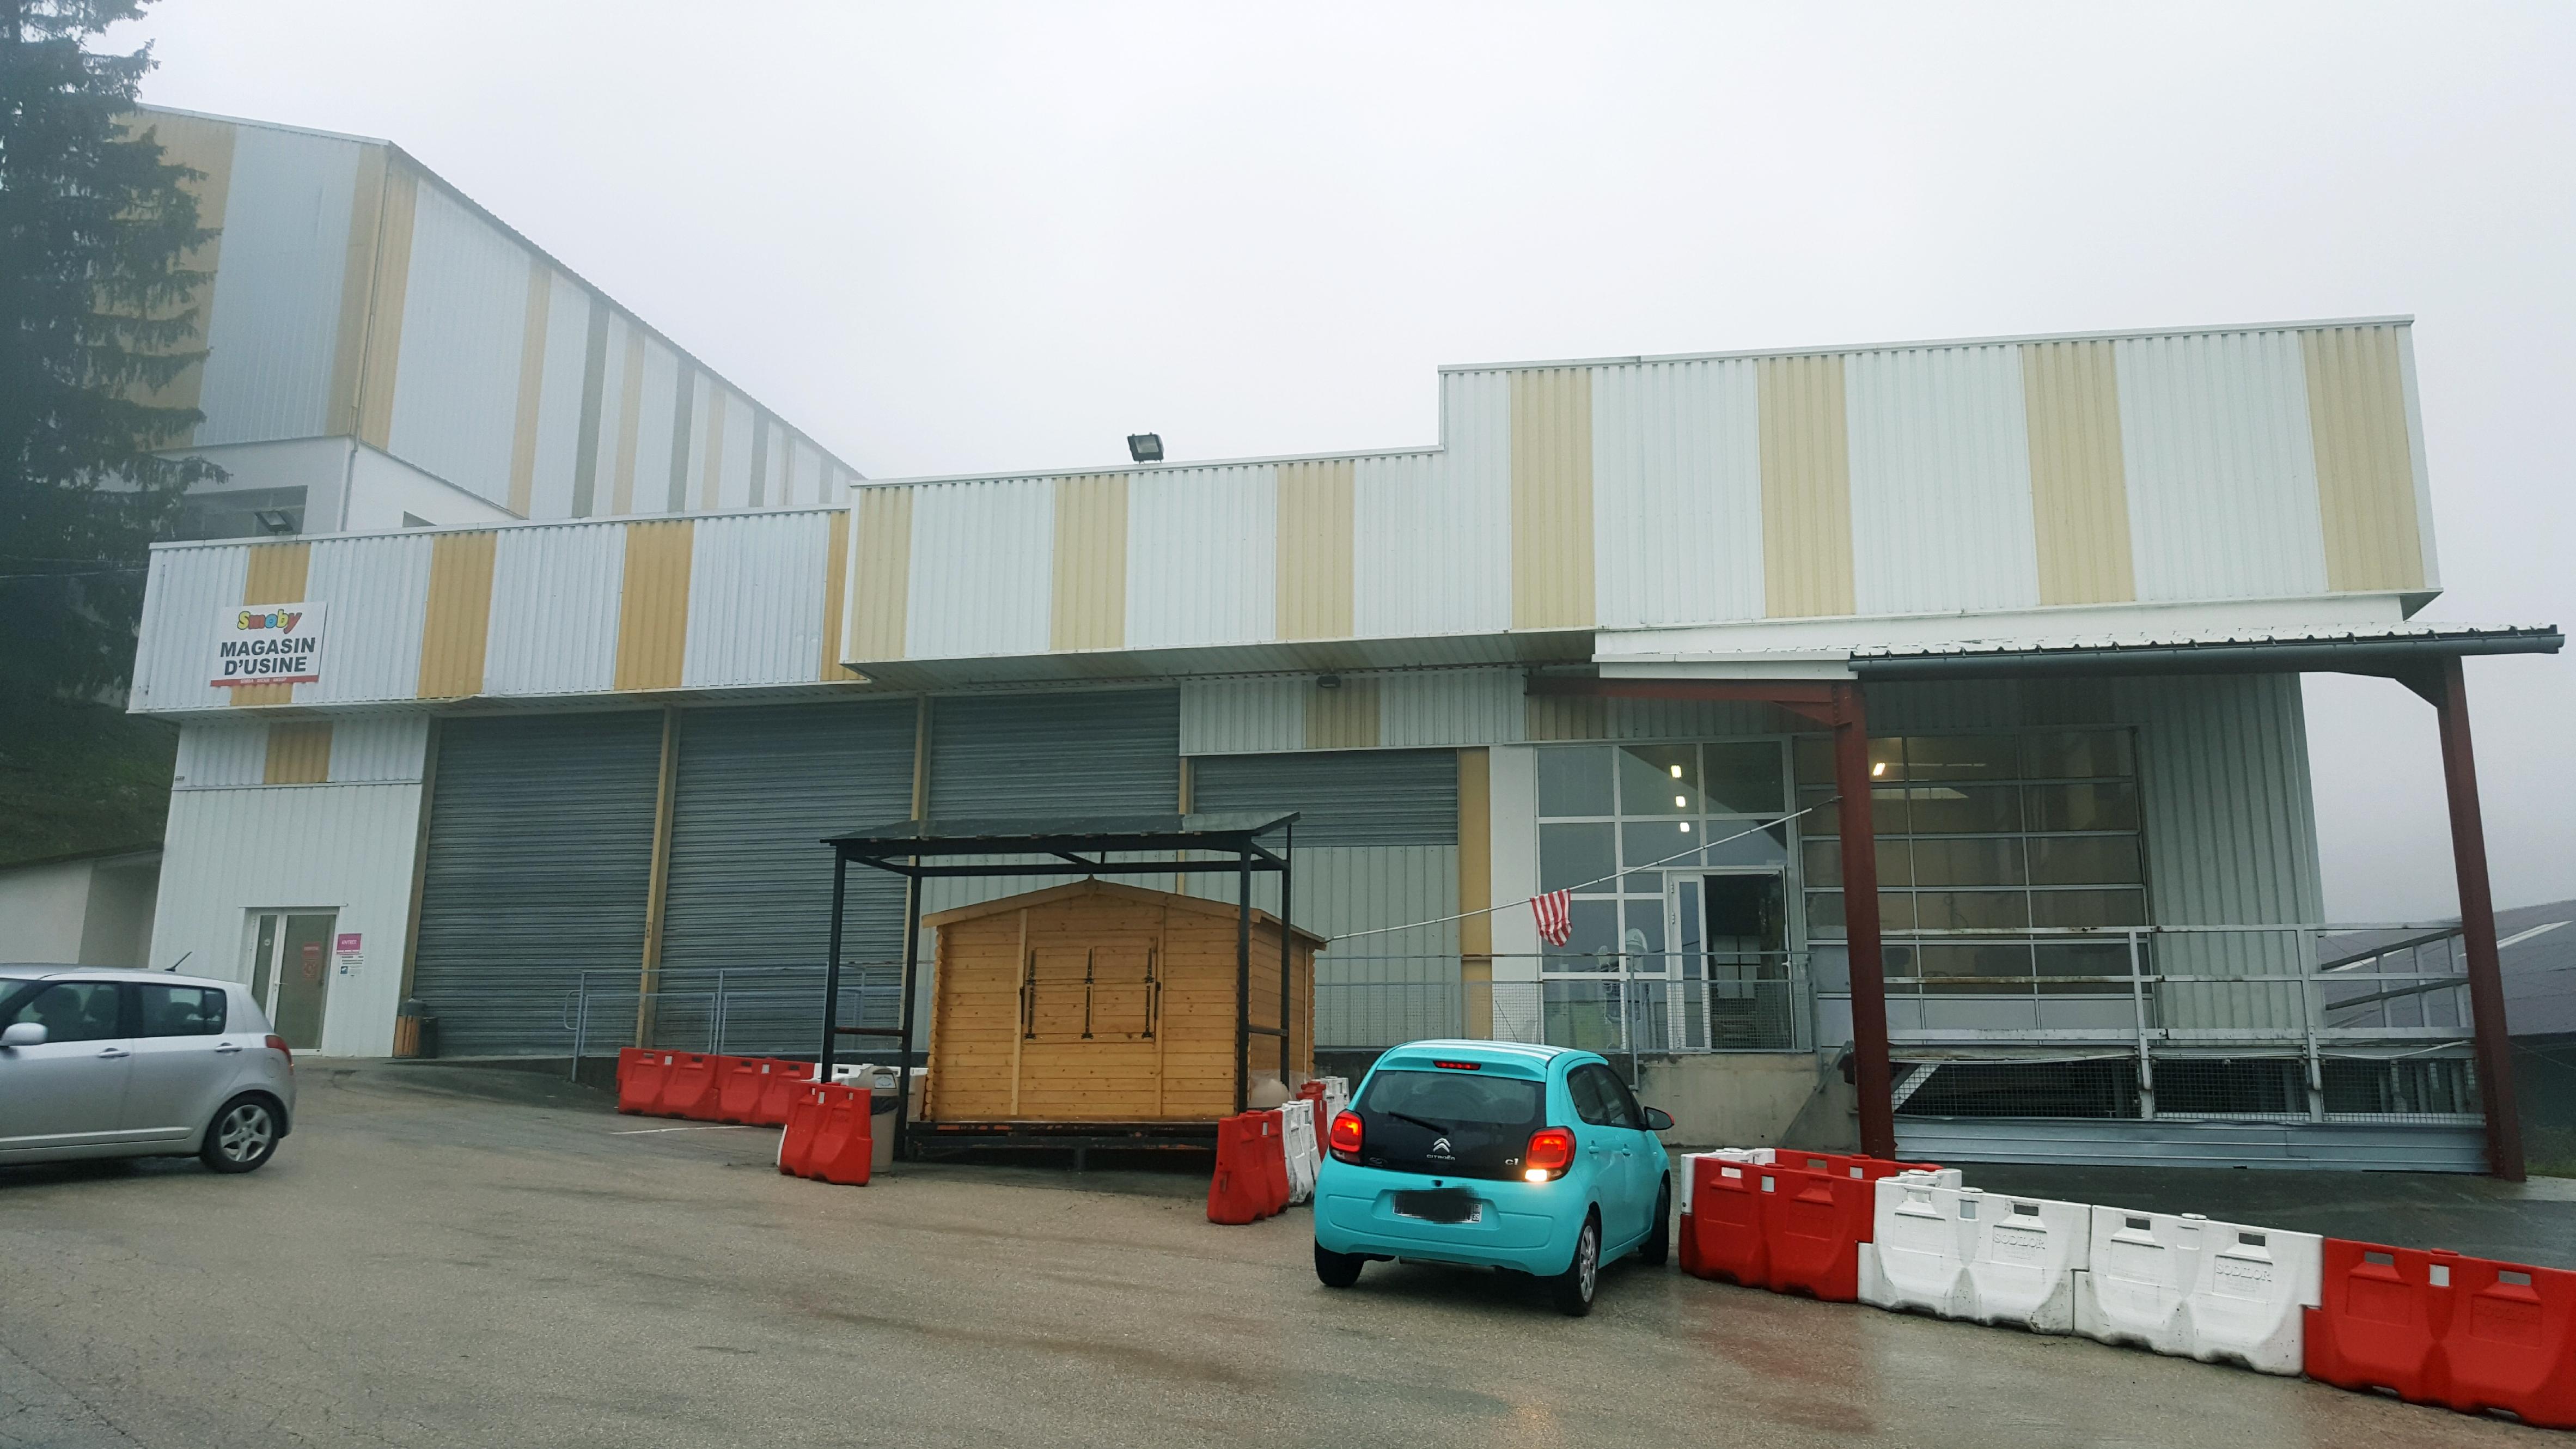 facademagasin d'usine smoby.jpg